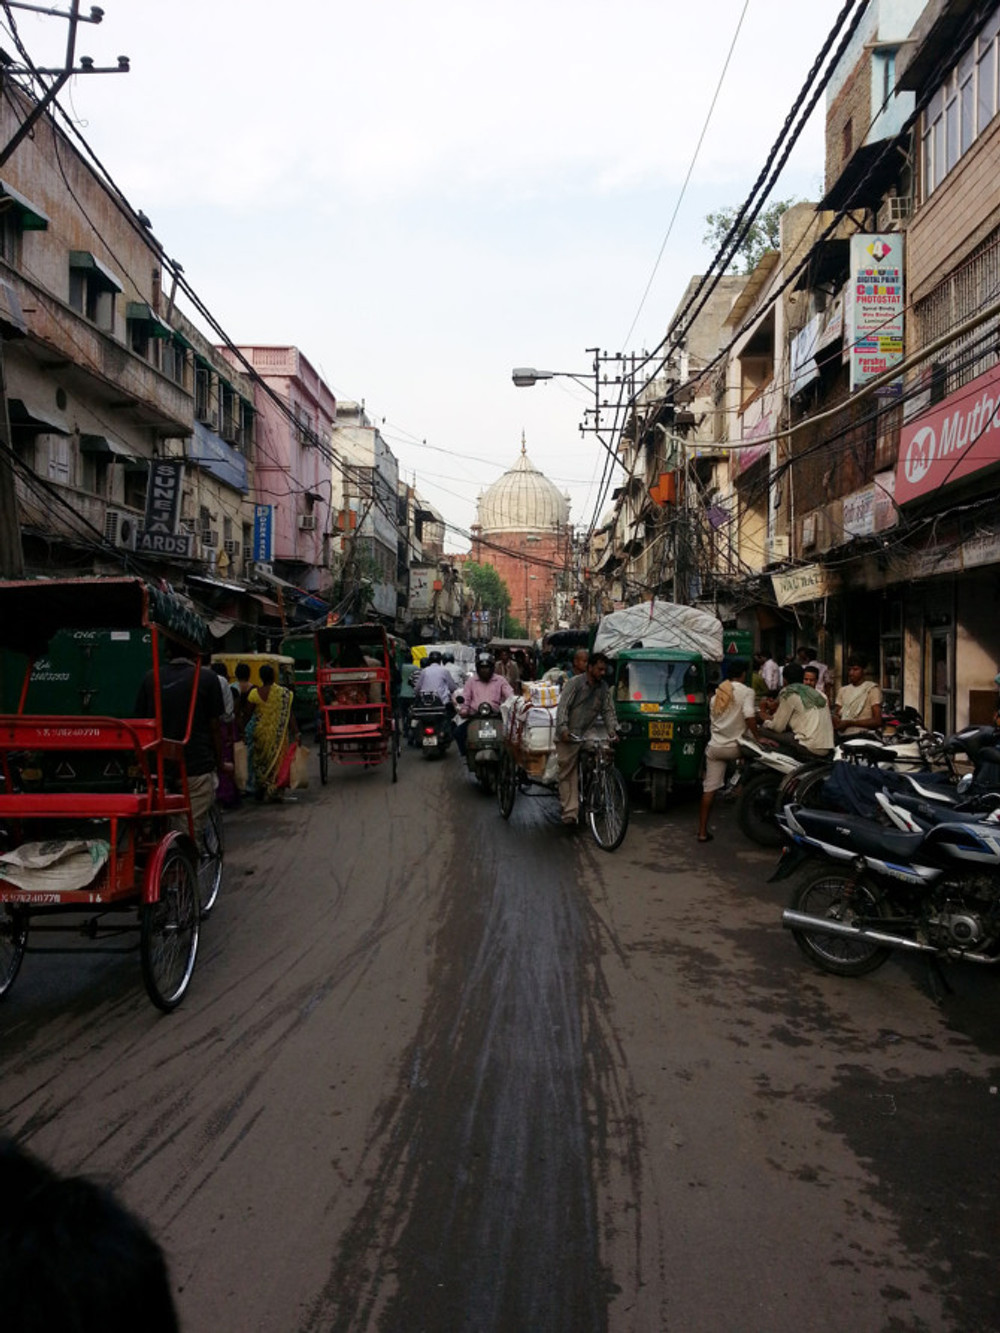 The lane leading towards Chandni Chowk